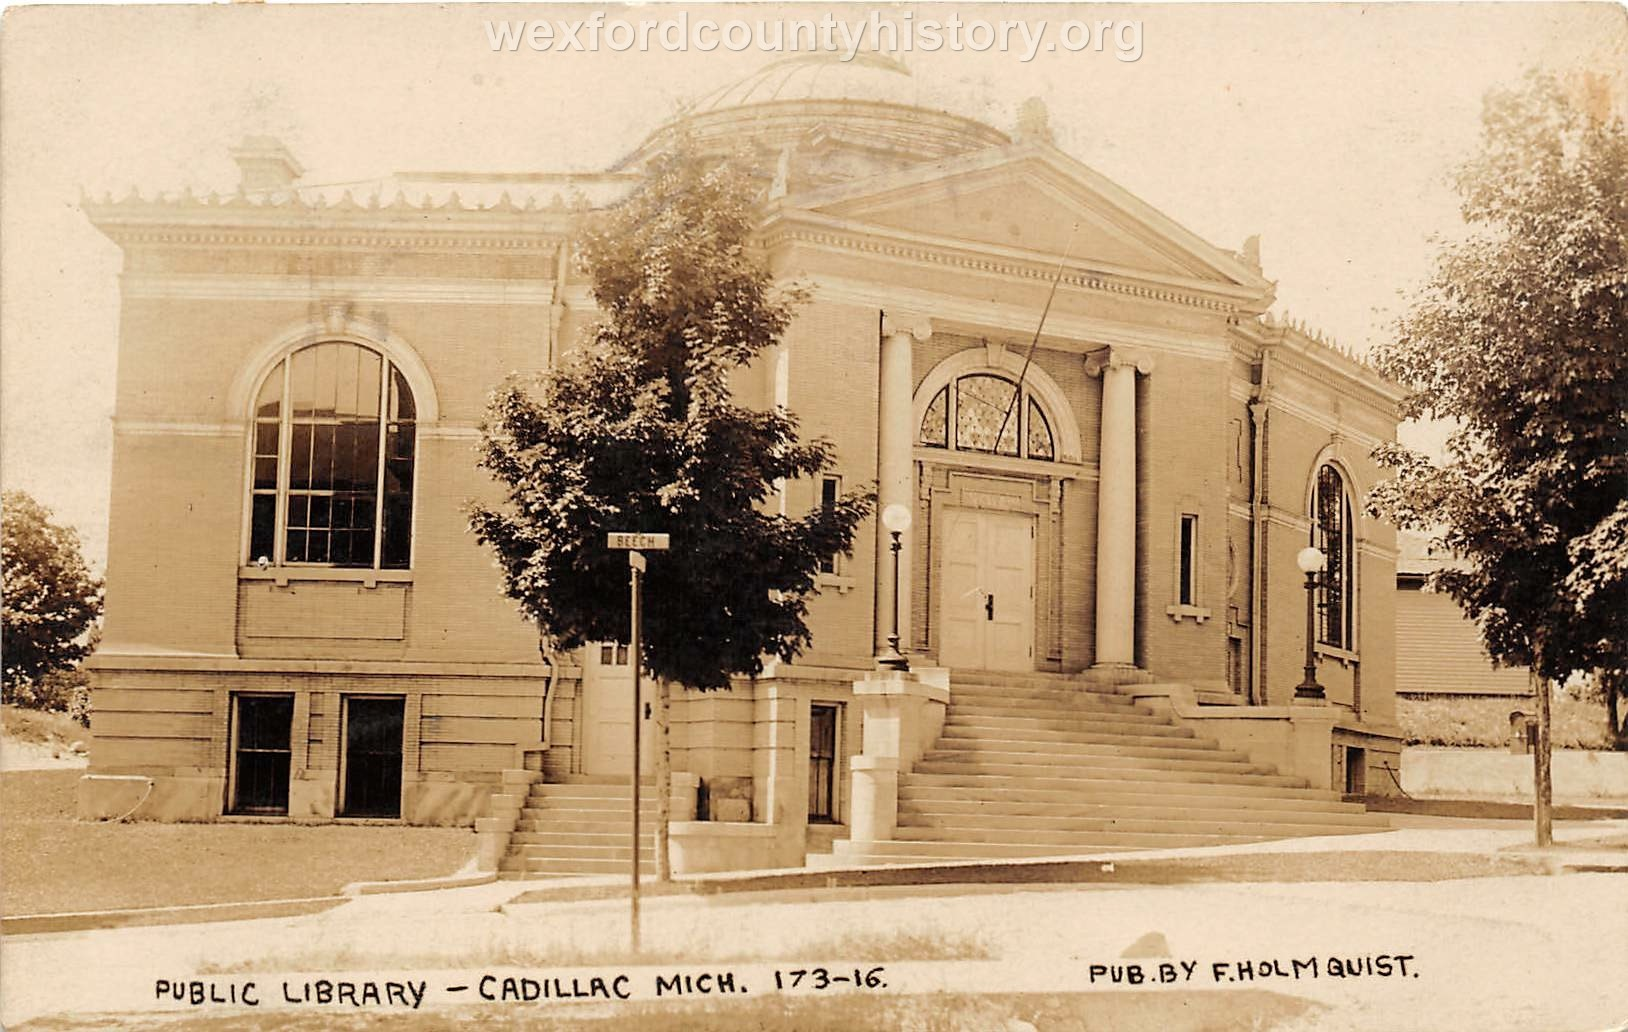 Cadillac Public Library